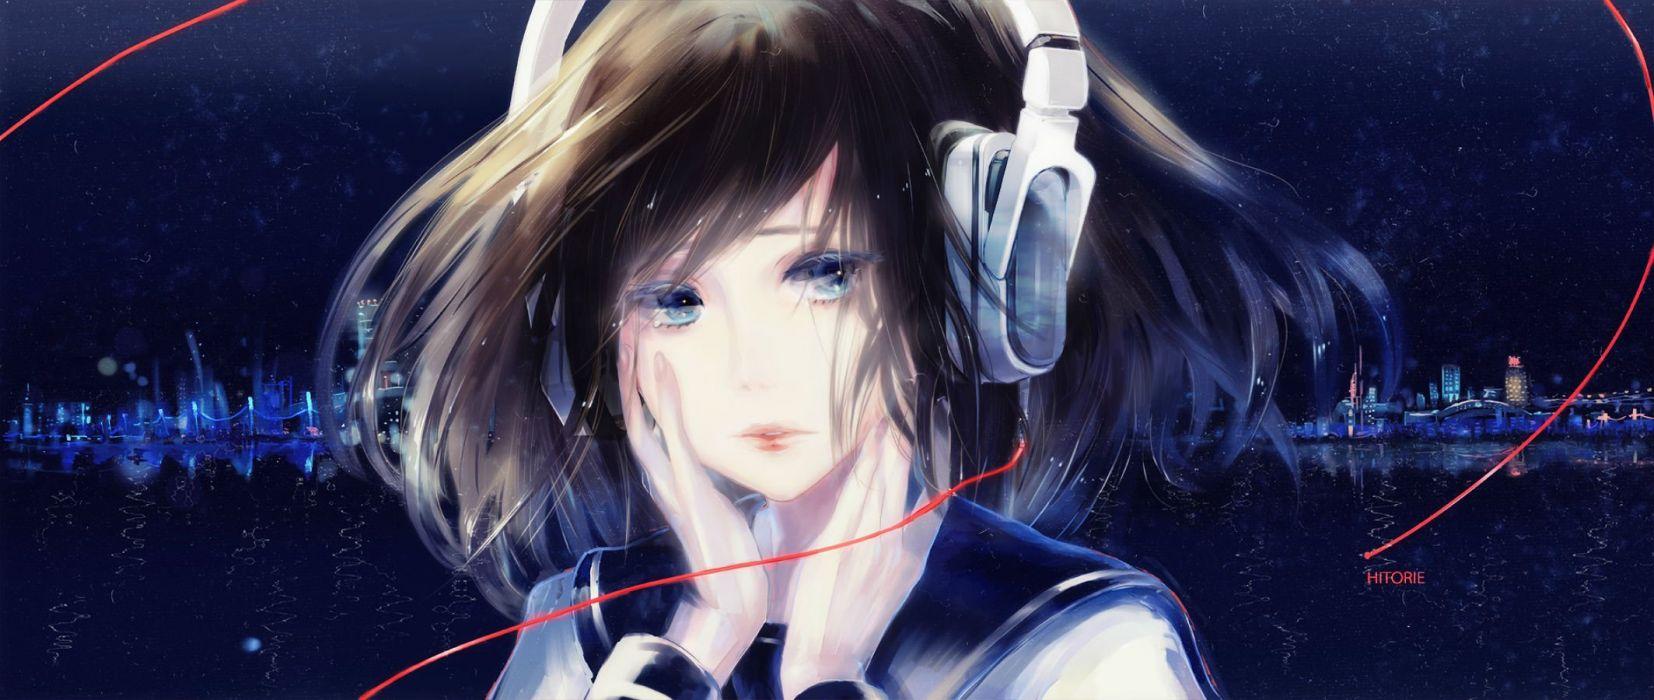 blue eyes brown hair city dualscreen headphones night scenic seifuku tagme (artist) water wallpaper